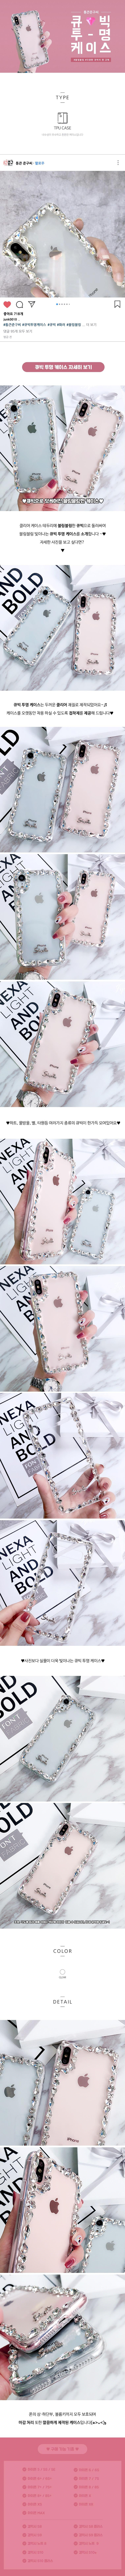 Tongkun Jungu iPhone All models iPhone 11 Pro Max iPhone XR iPhone XS MAX iPhone 6 iPhone 7 iPhone 8 Plus Cubic Transparent Case